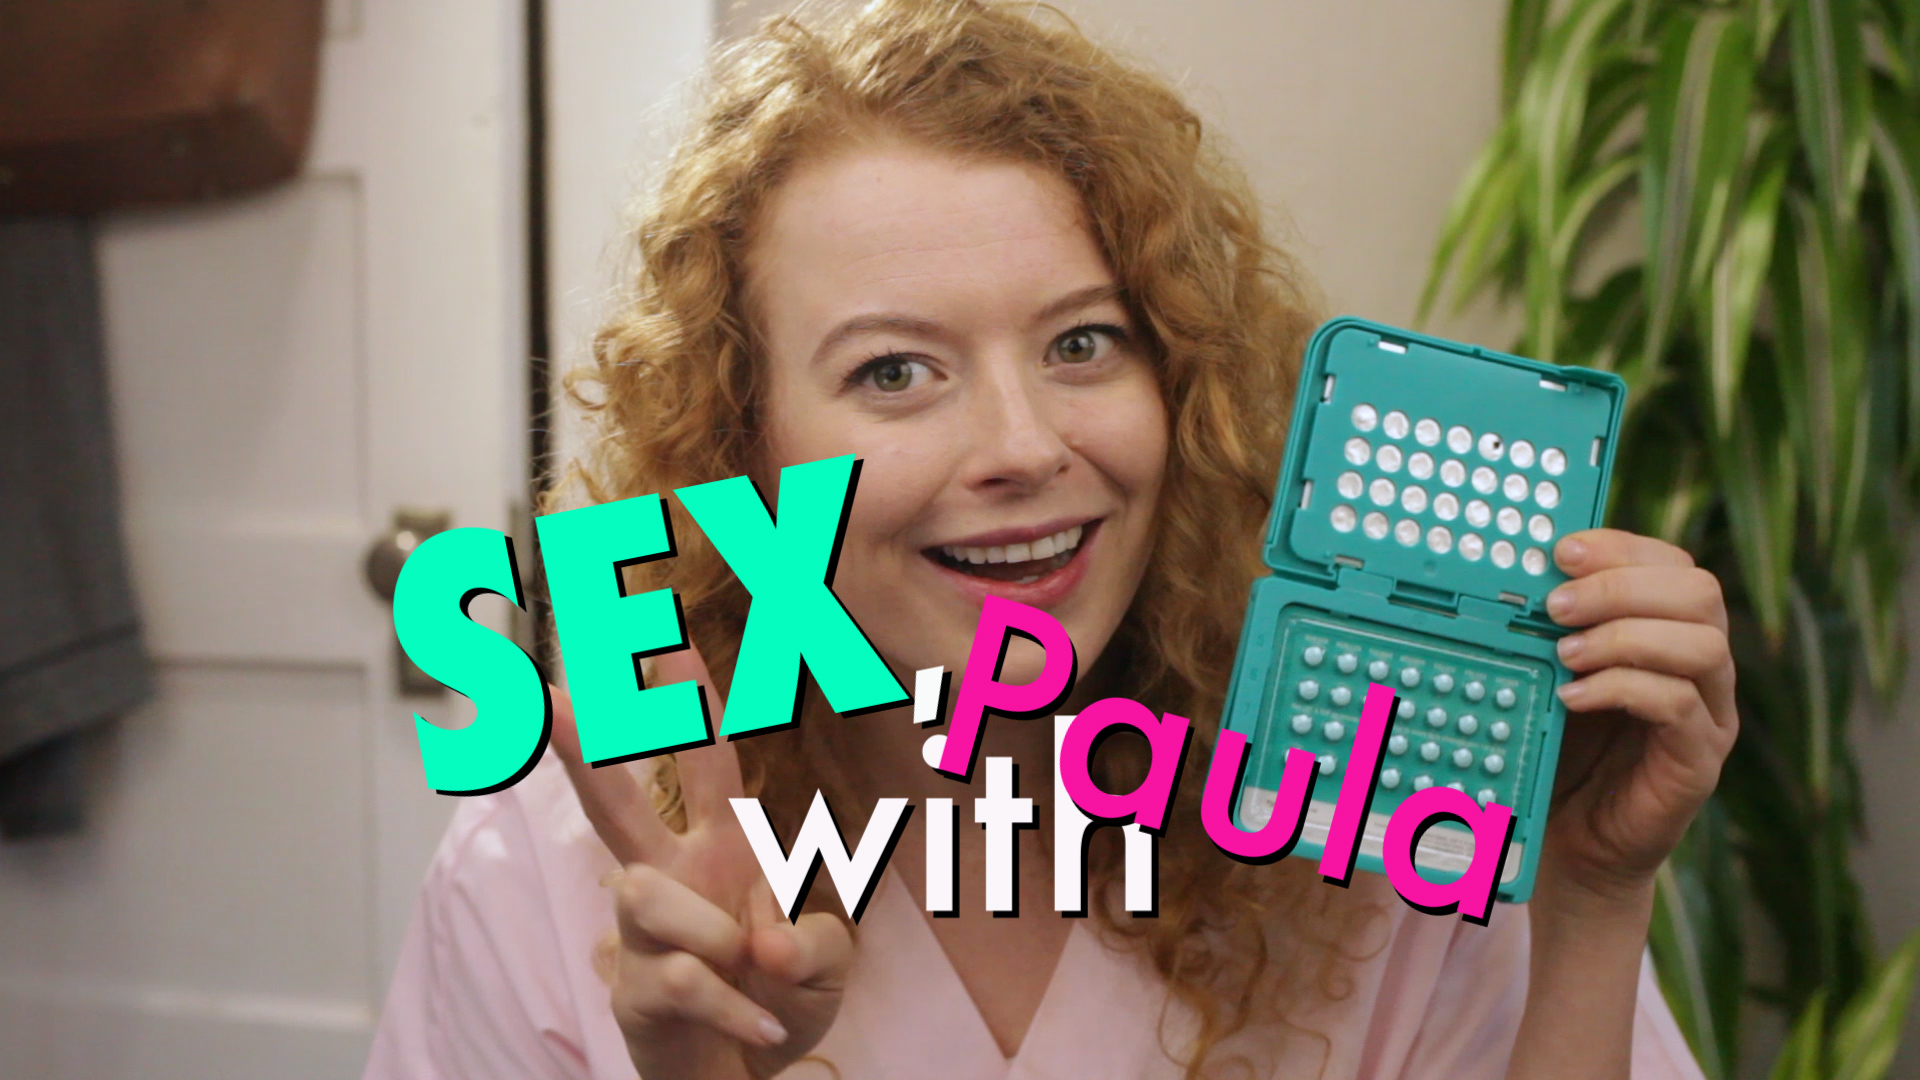 Paula Burrows in Sex, with Paula (2017)